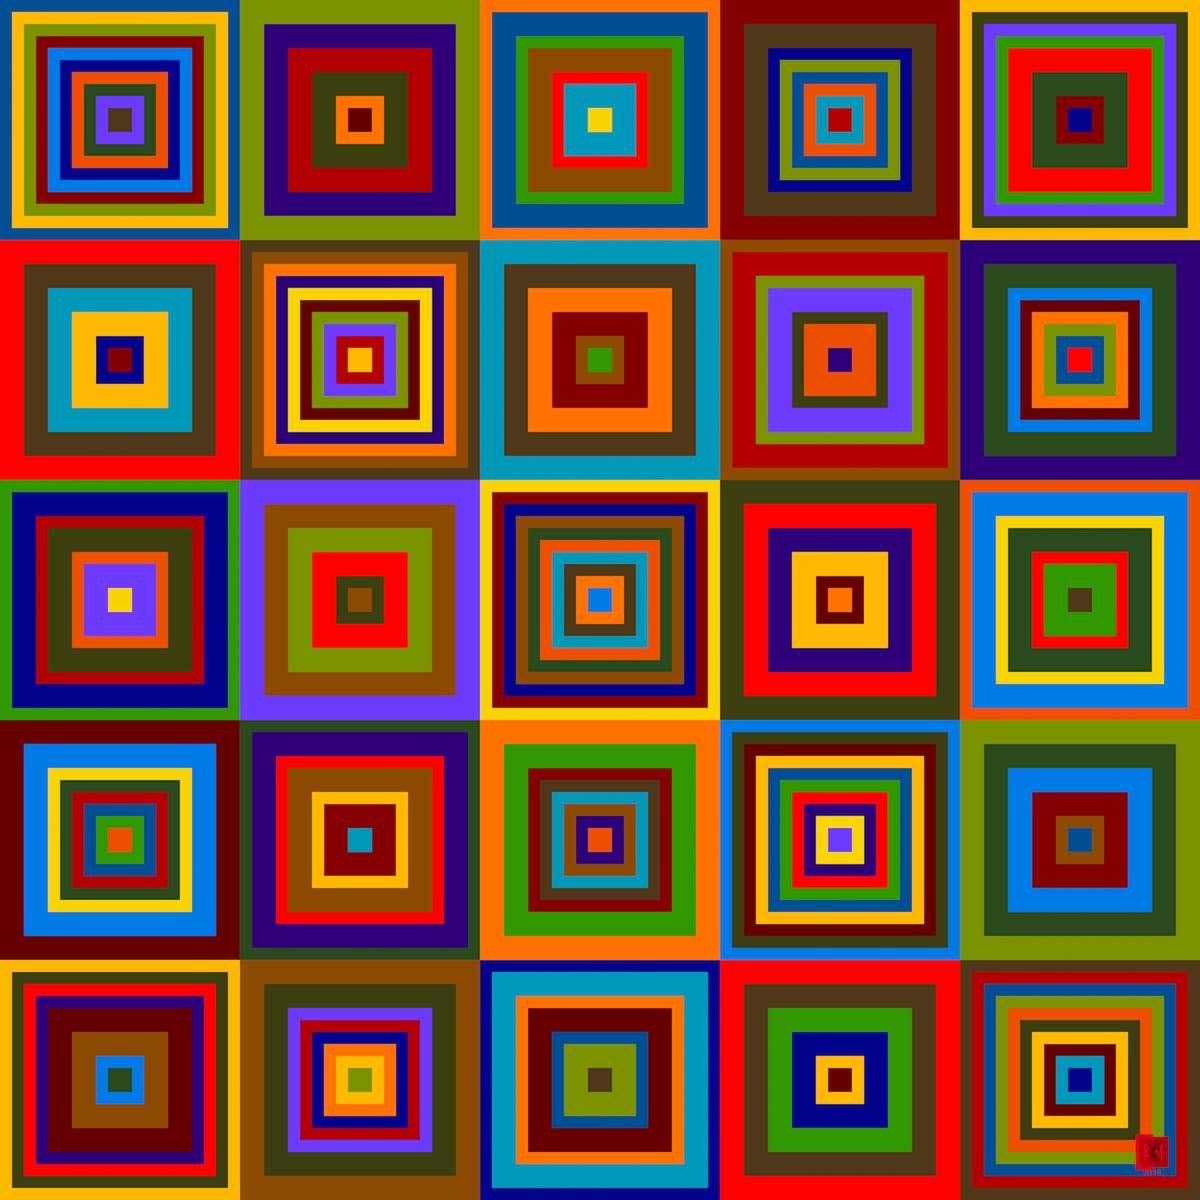 094 (800 x 800).jpg